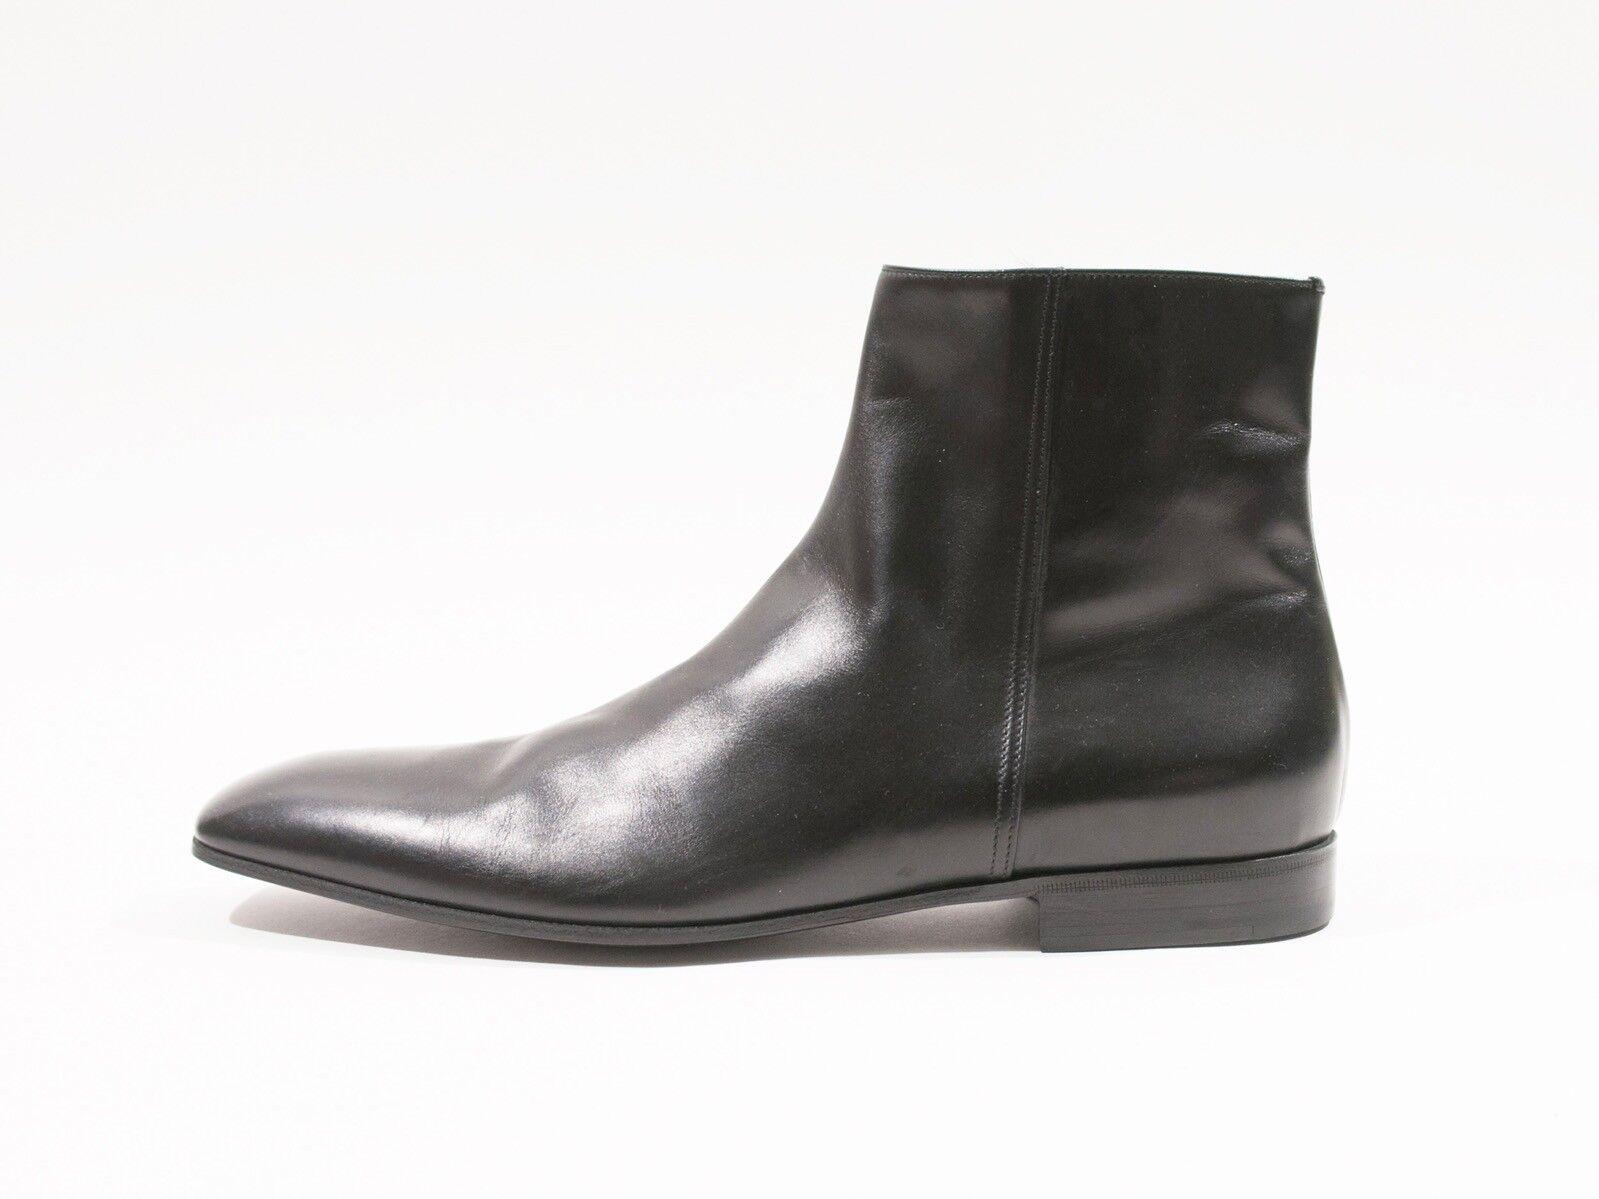 Prada NWT Black Chelsea Boots 10.5 9853